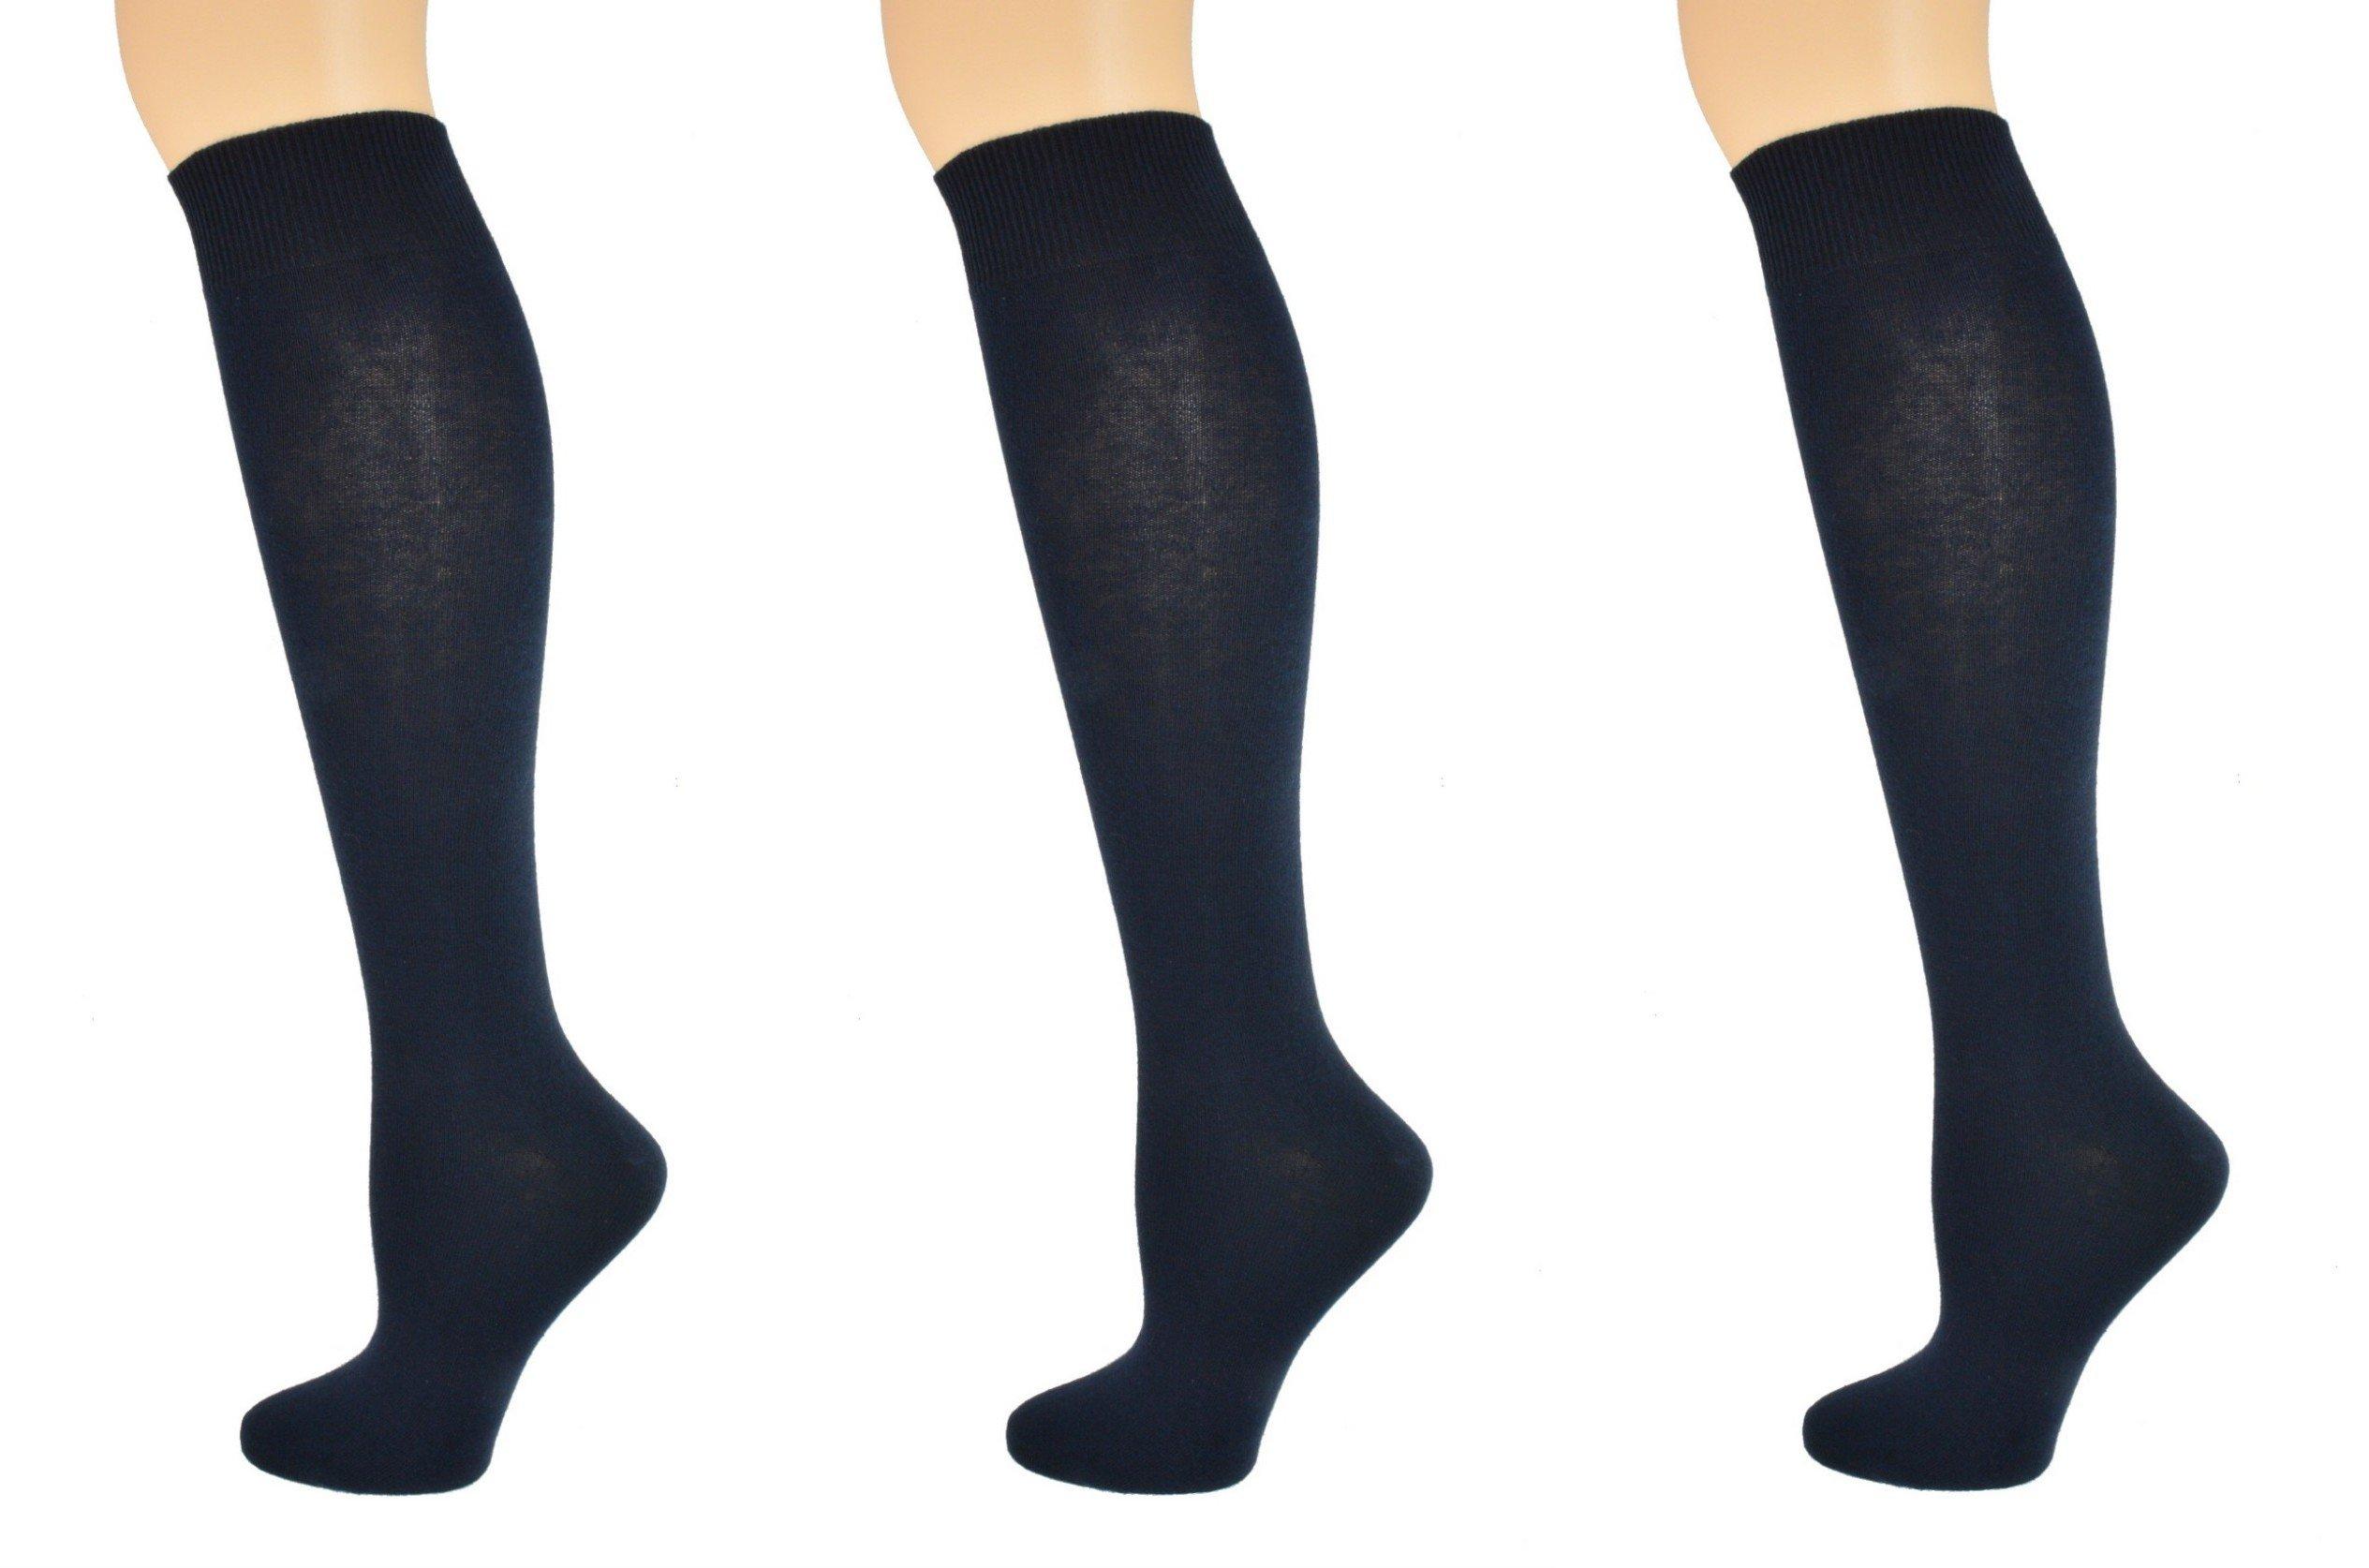 Sierra Socks Girl's School Uniform Knee High 3 pair Pack Cotton Socks G7200 (XL/Shoe Size 9-13, Navy)